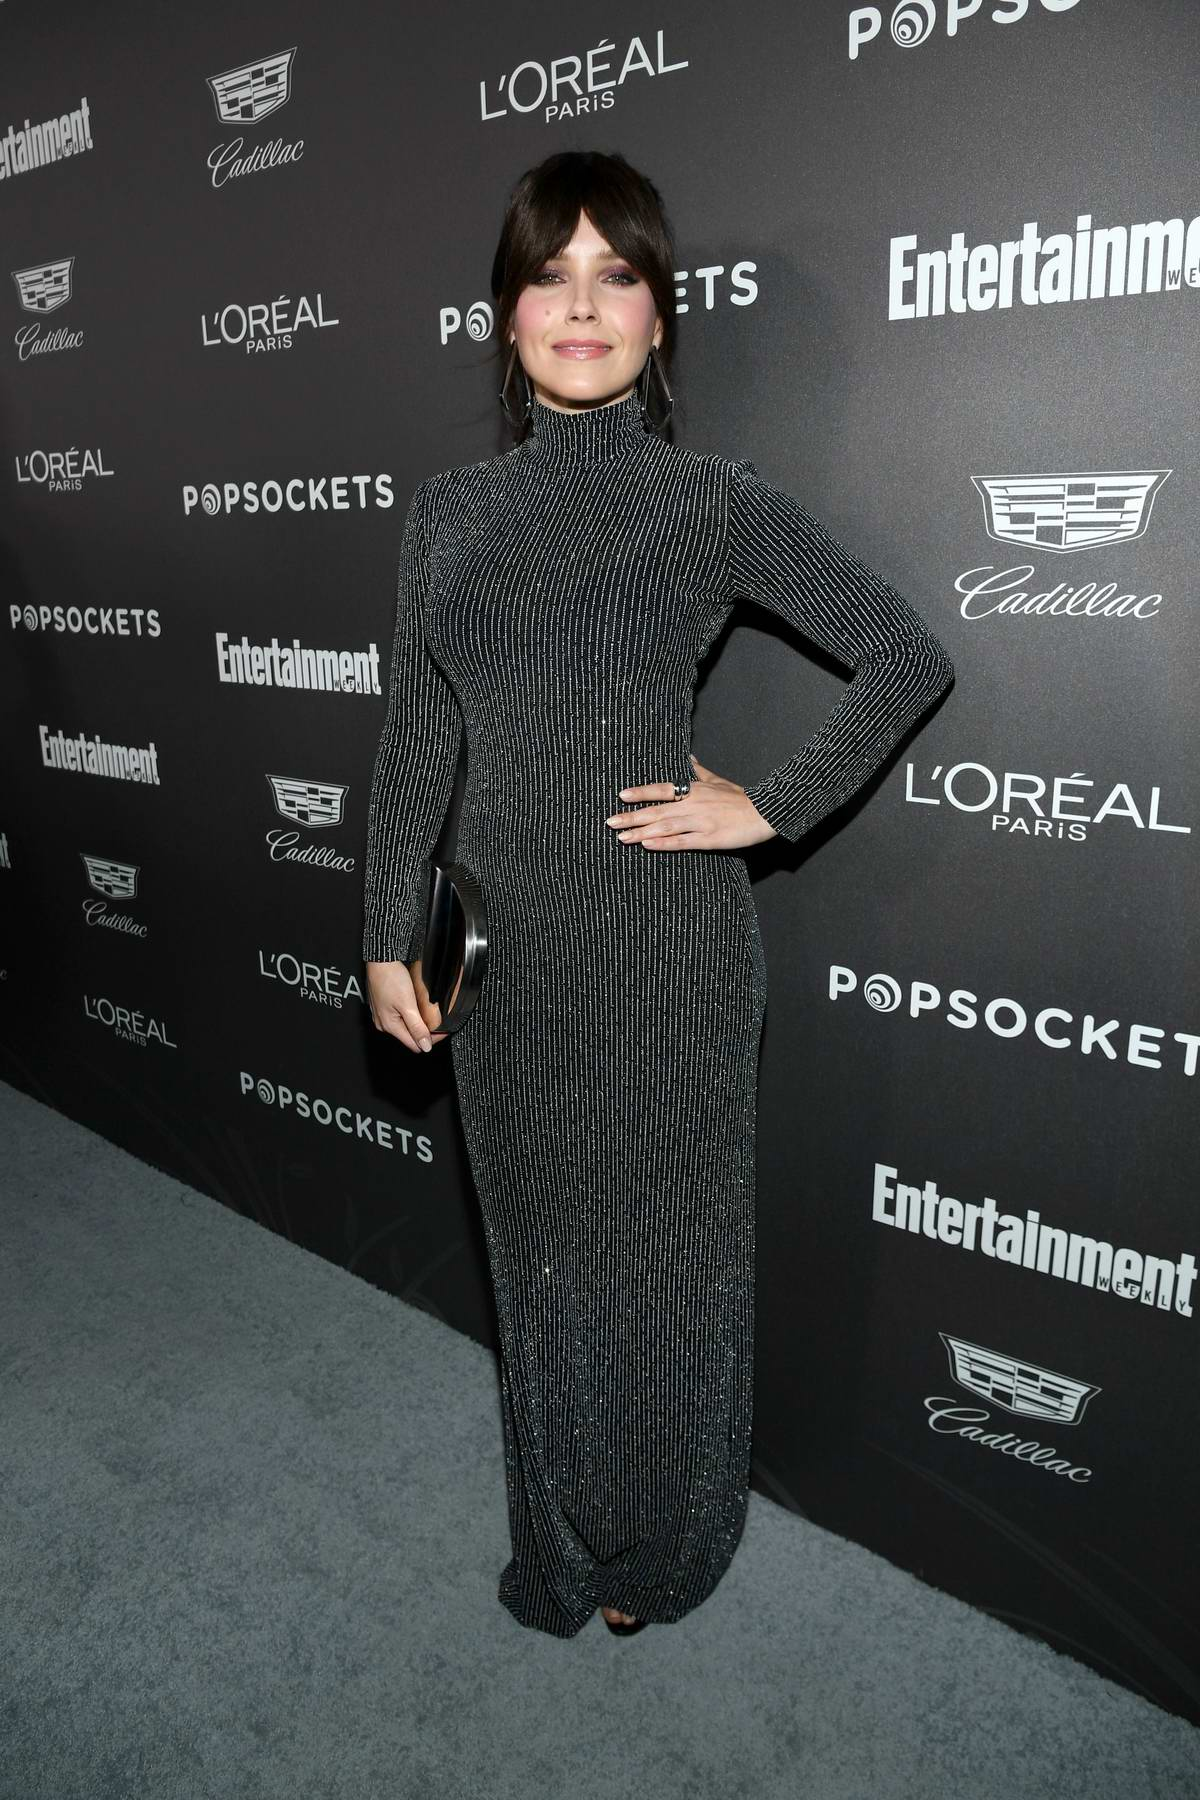 Sophia Bush attends Entertainment Weekly Pre-SAG 2019 Party in Los Angeles